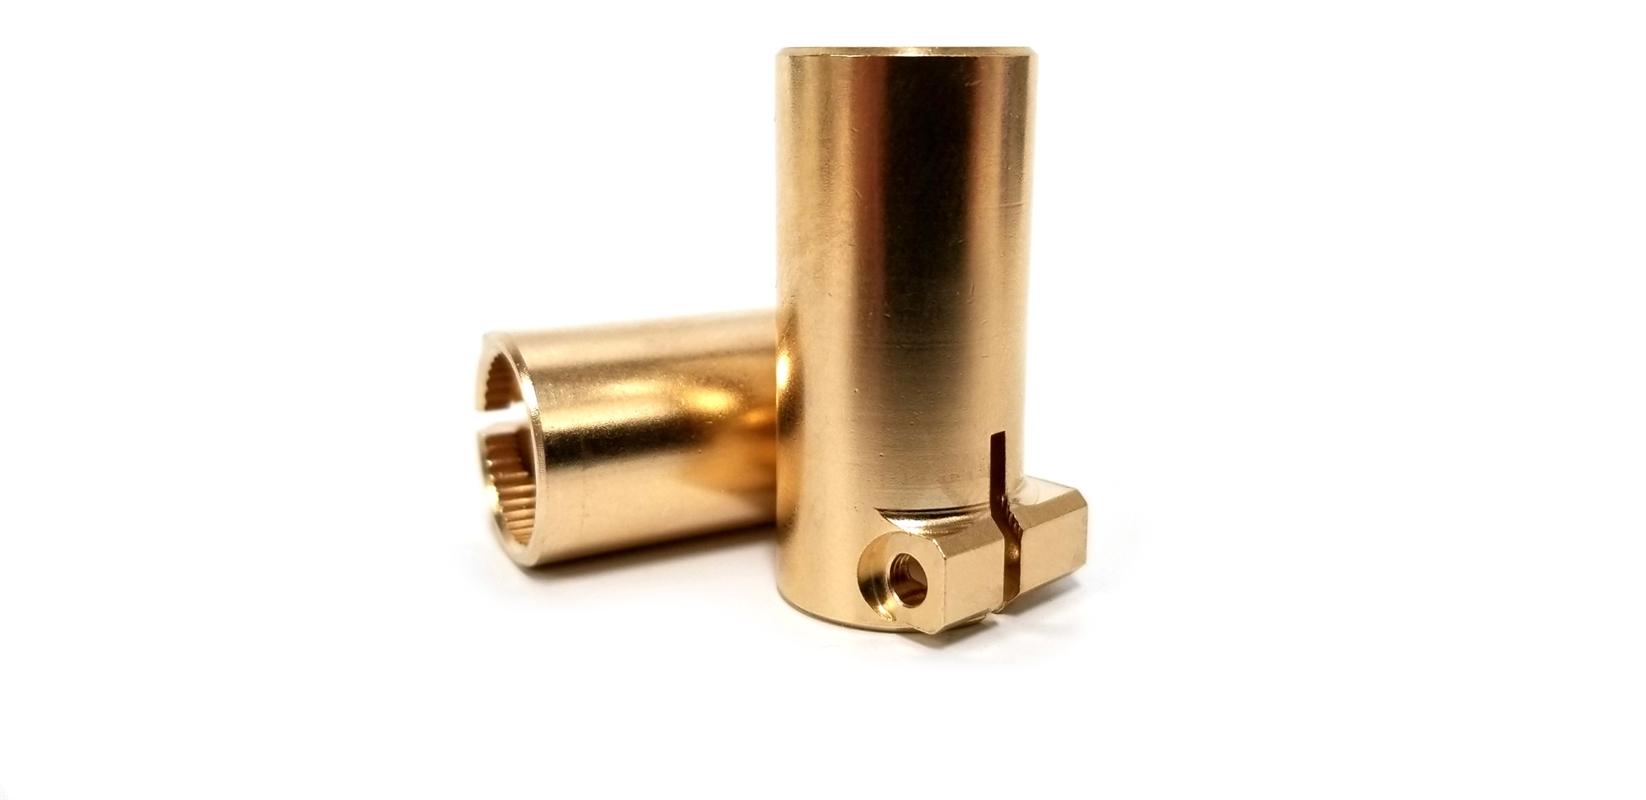 Beef Tubes SCX10 II / AR44 Brass Lockouts